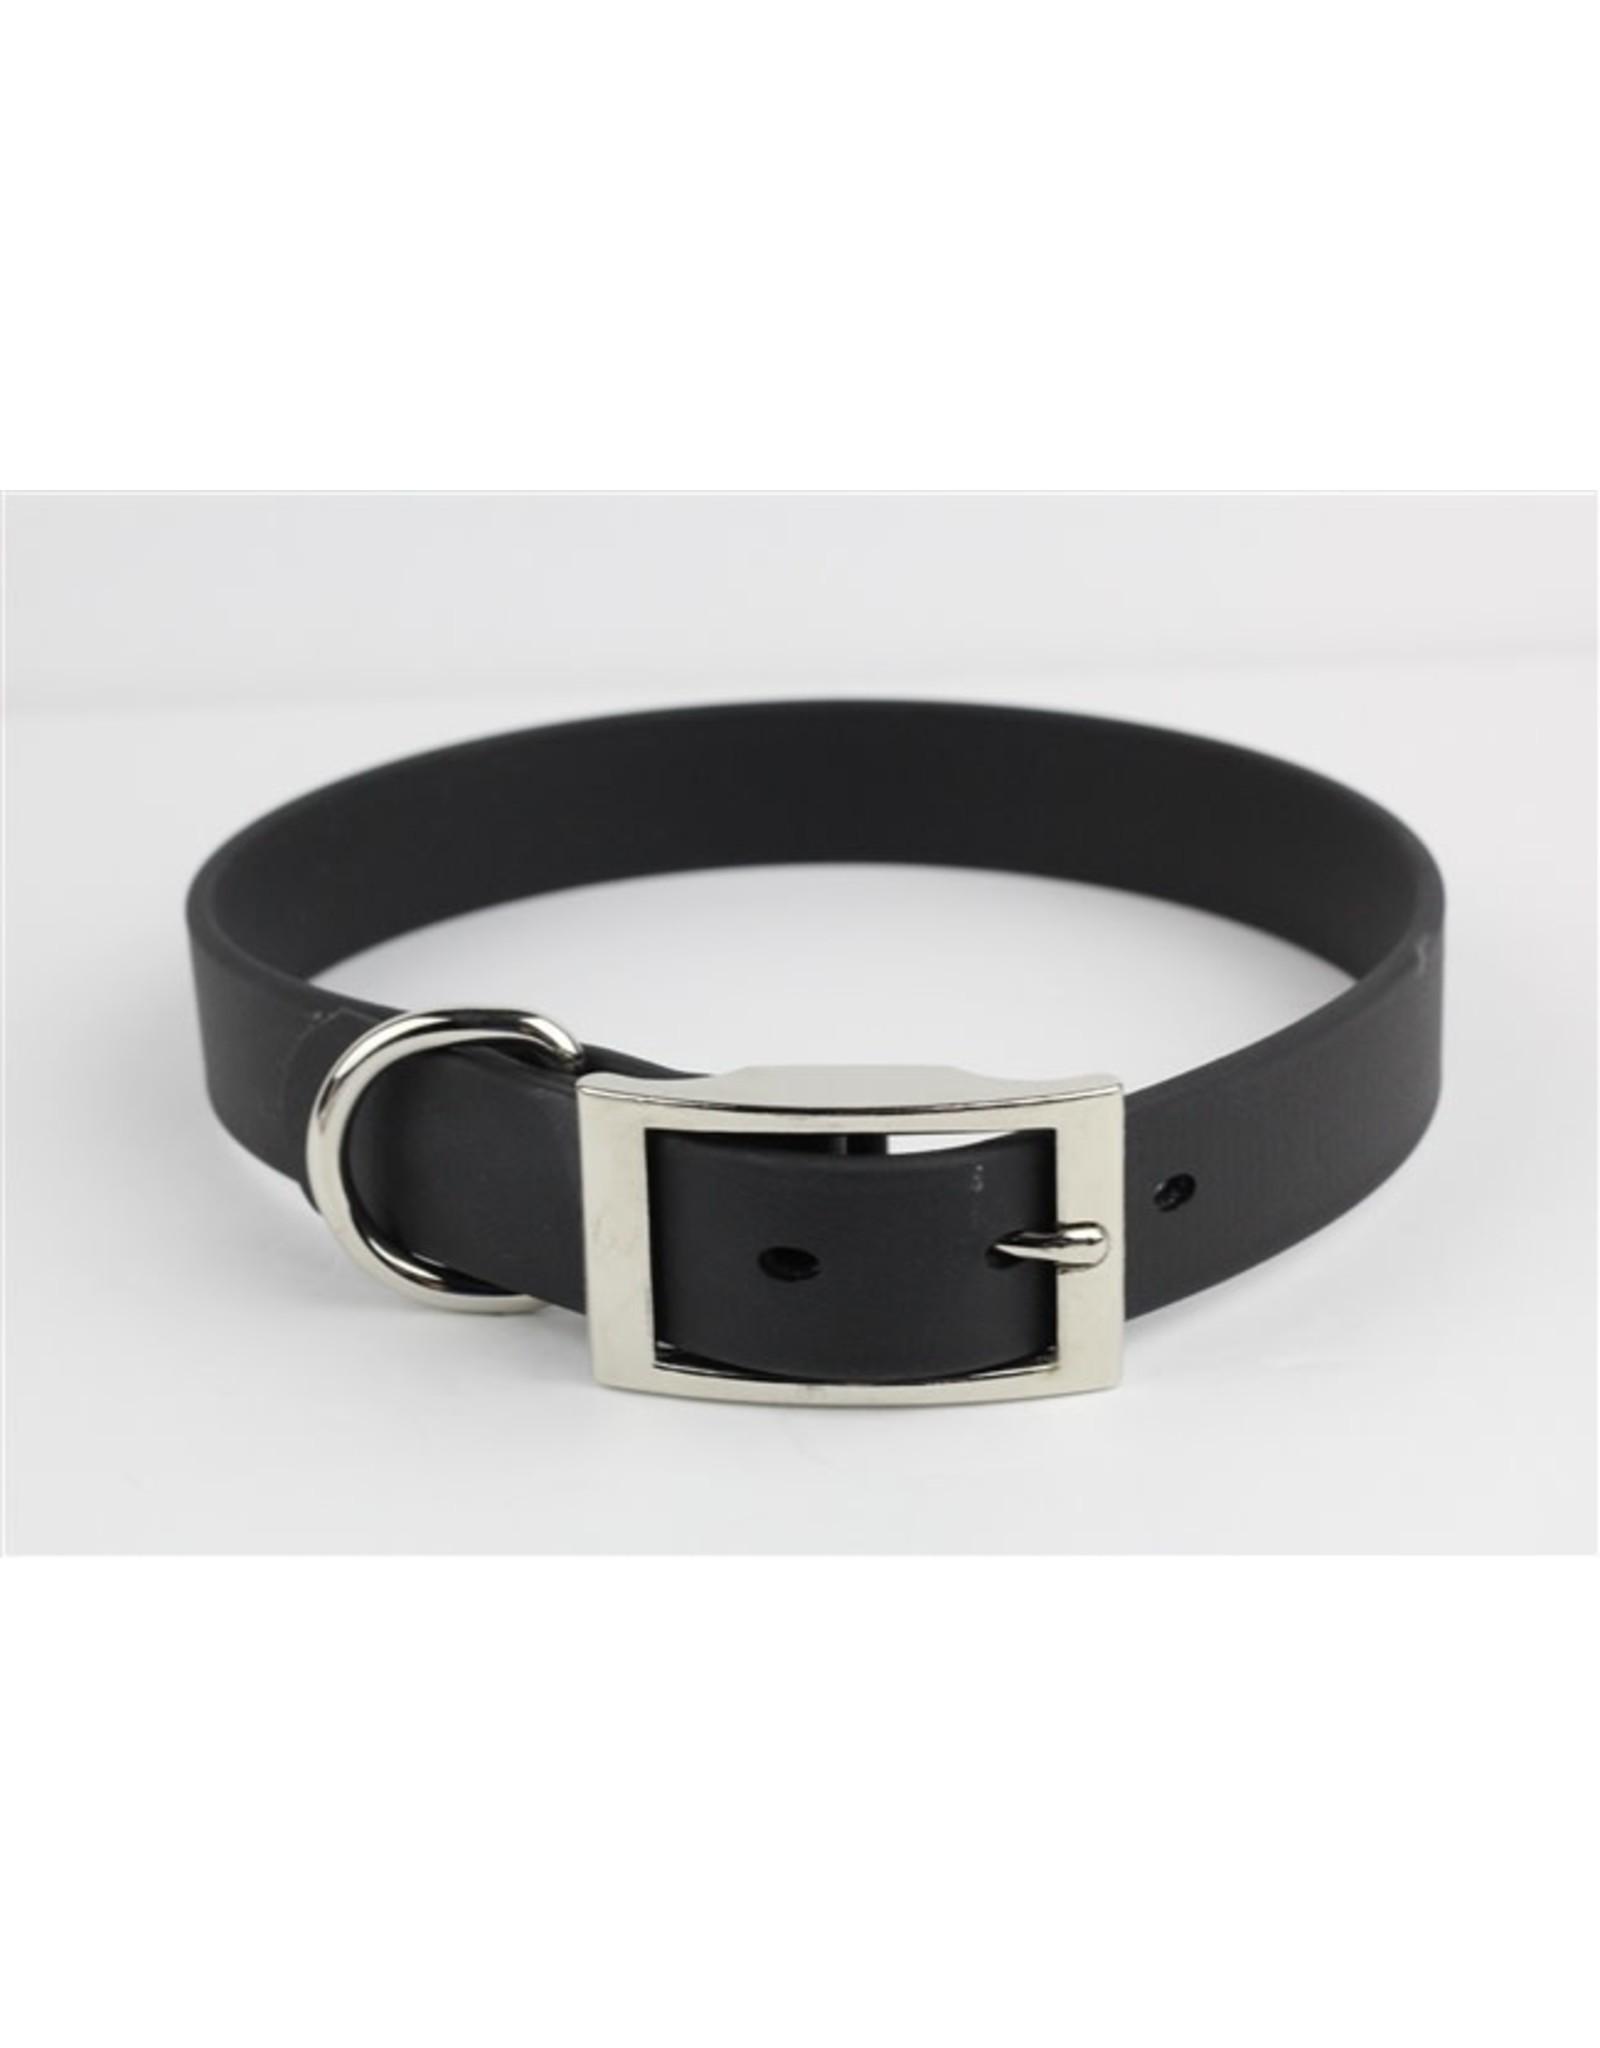 Locatis Locatis Synthetic Leather Strap Collar